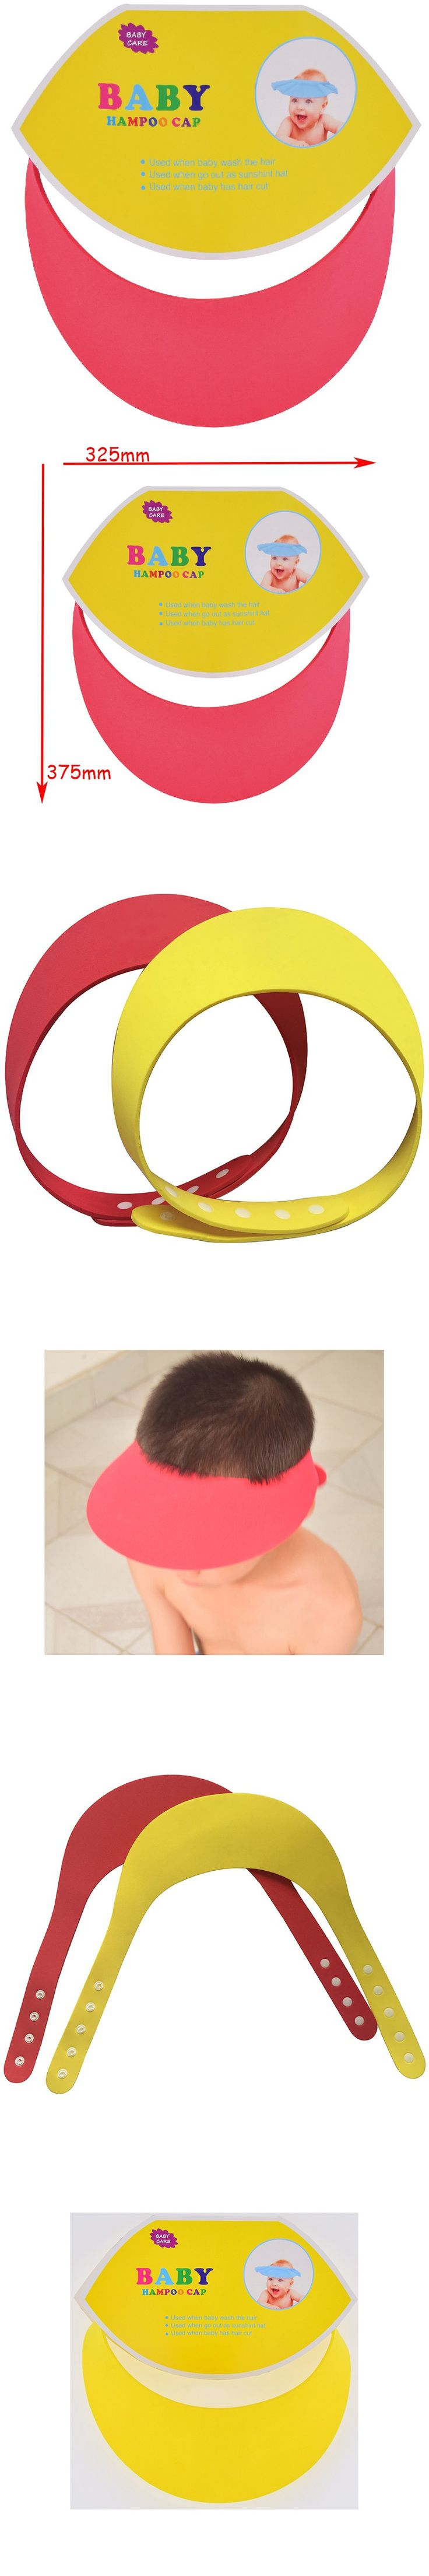 1 Pc EVA Soft Infant Baby Care Bath Protection Baby Safety Shampoo Cap Free…